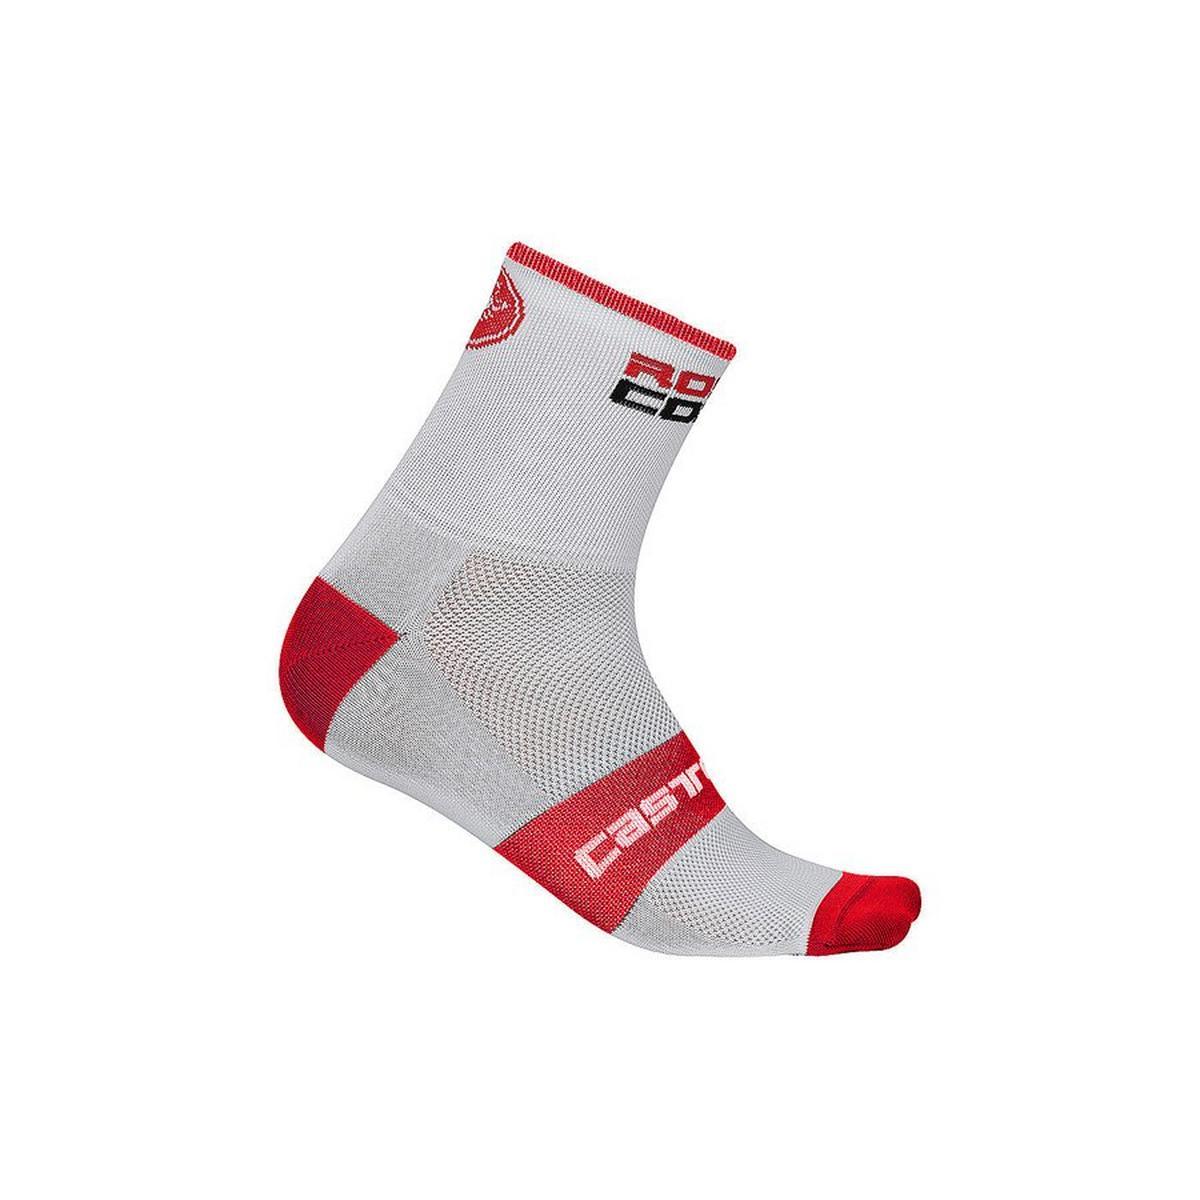 Castelli Men's Rosso Corsa 6 Sock